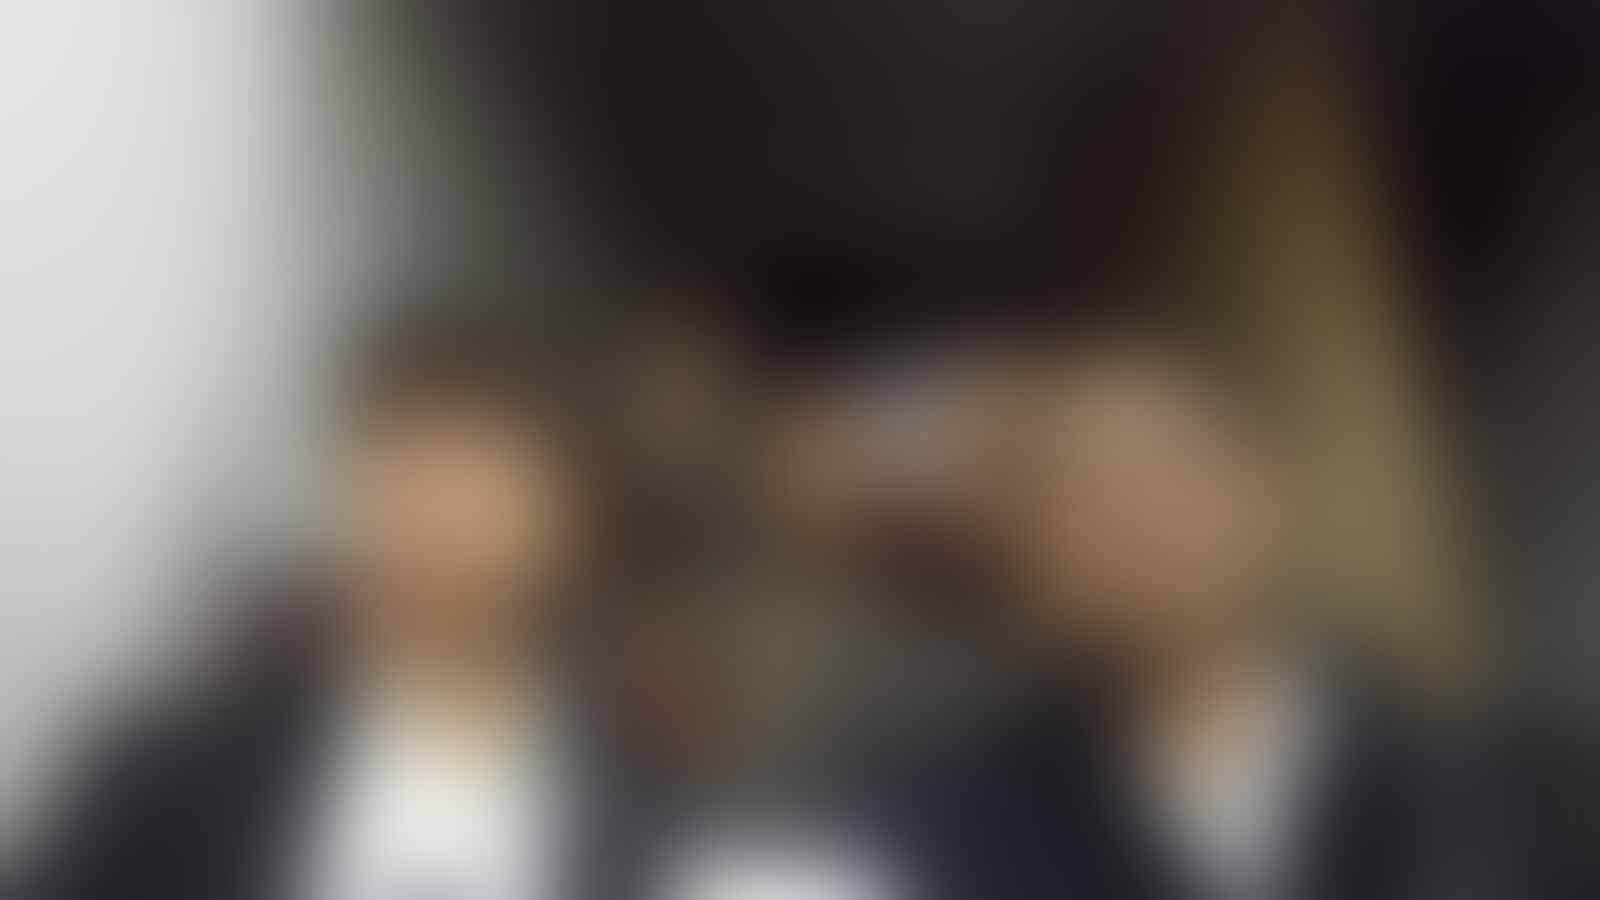 Dokter RSUD Tarakan Serahkan Rekam Medis Mahesa dan Aditya ke Polisi